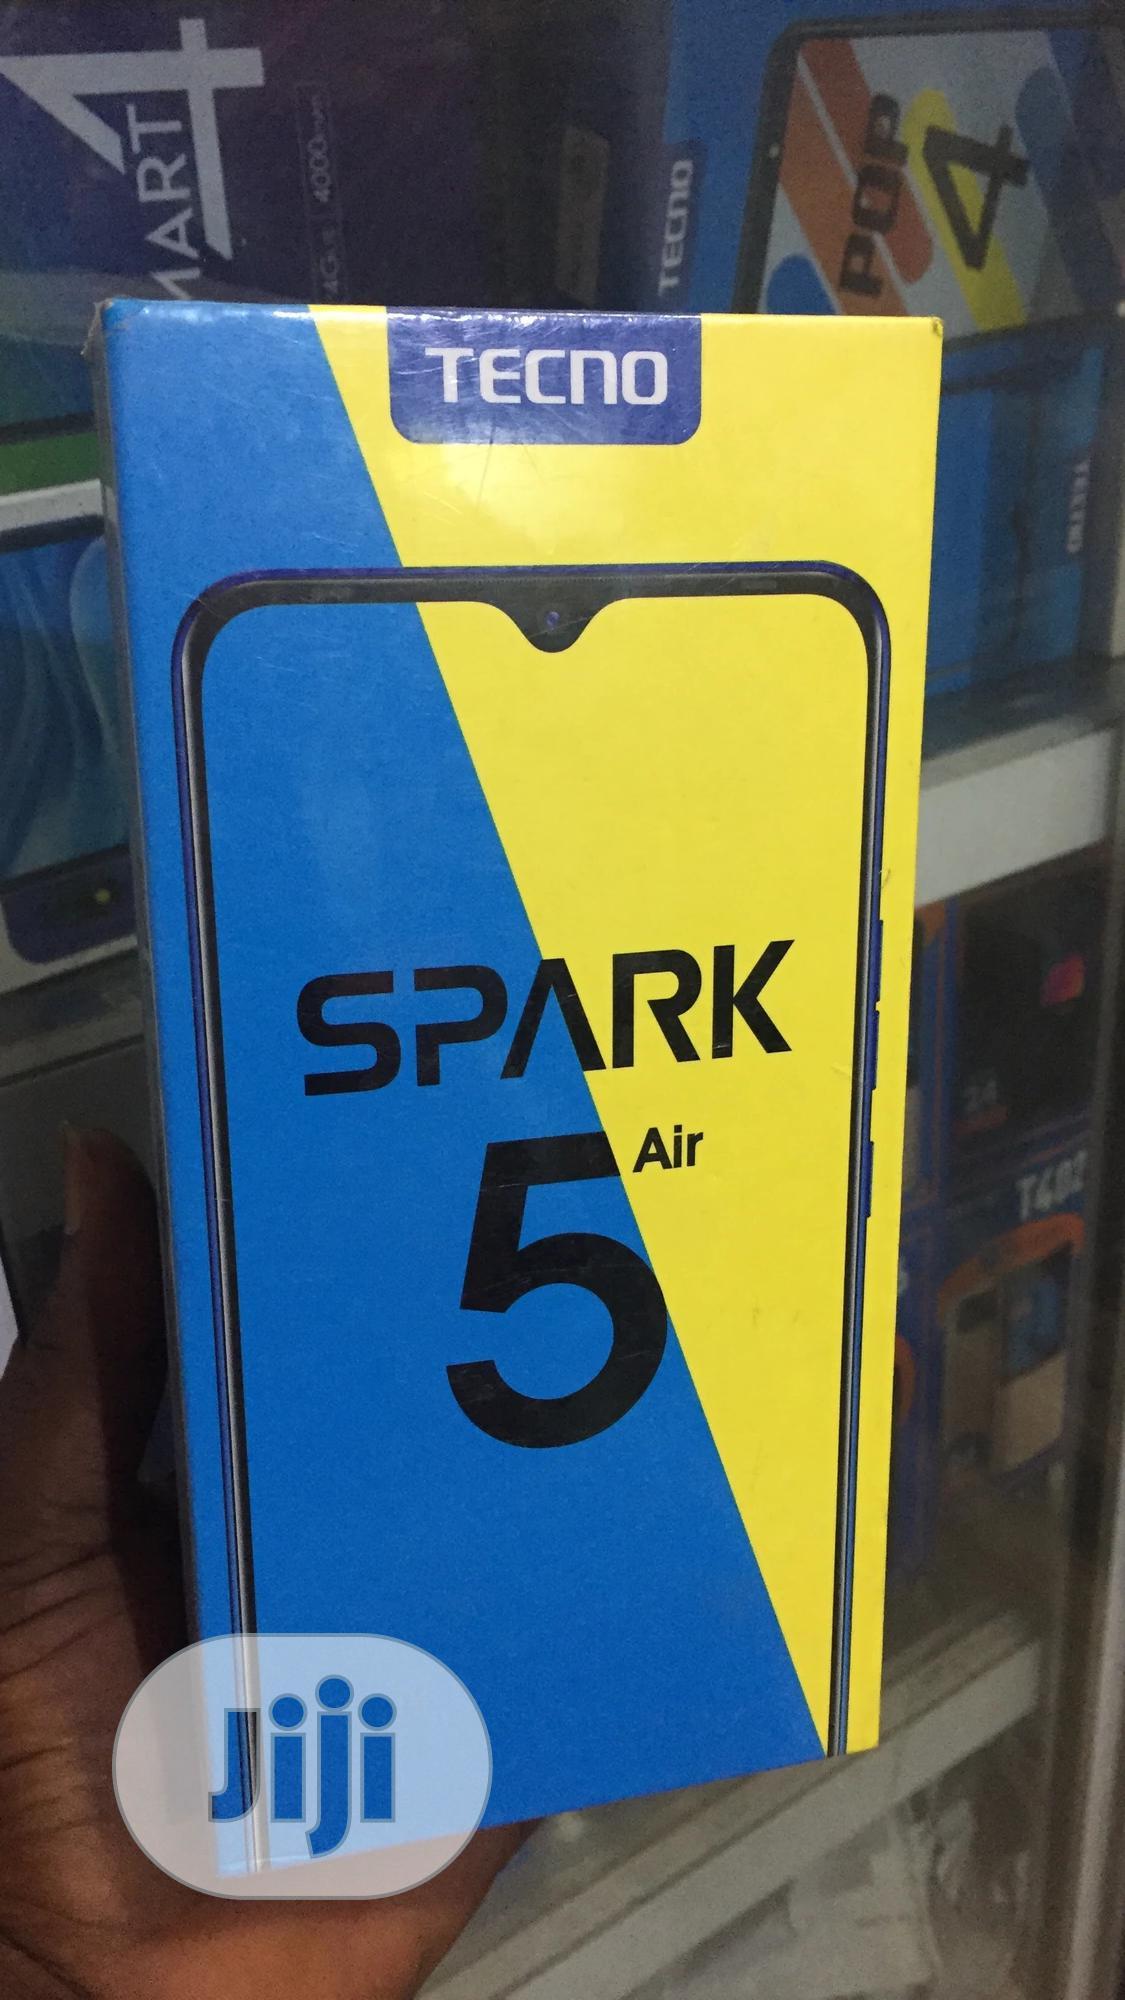 New Tecno Spark 5 Air 32 GB Black